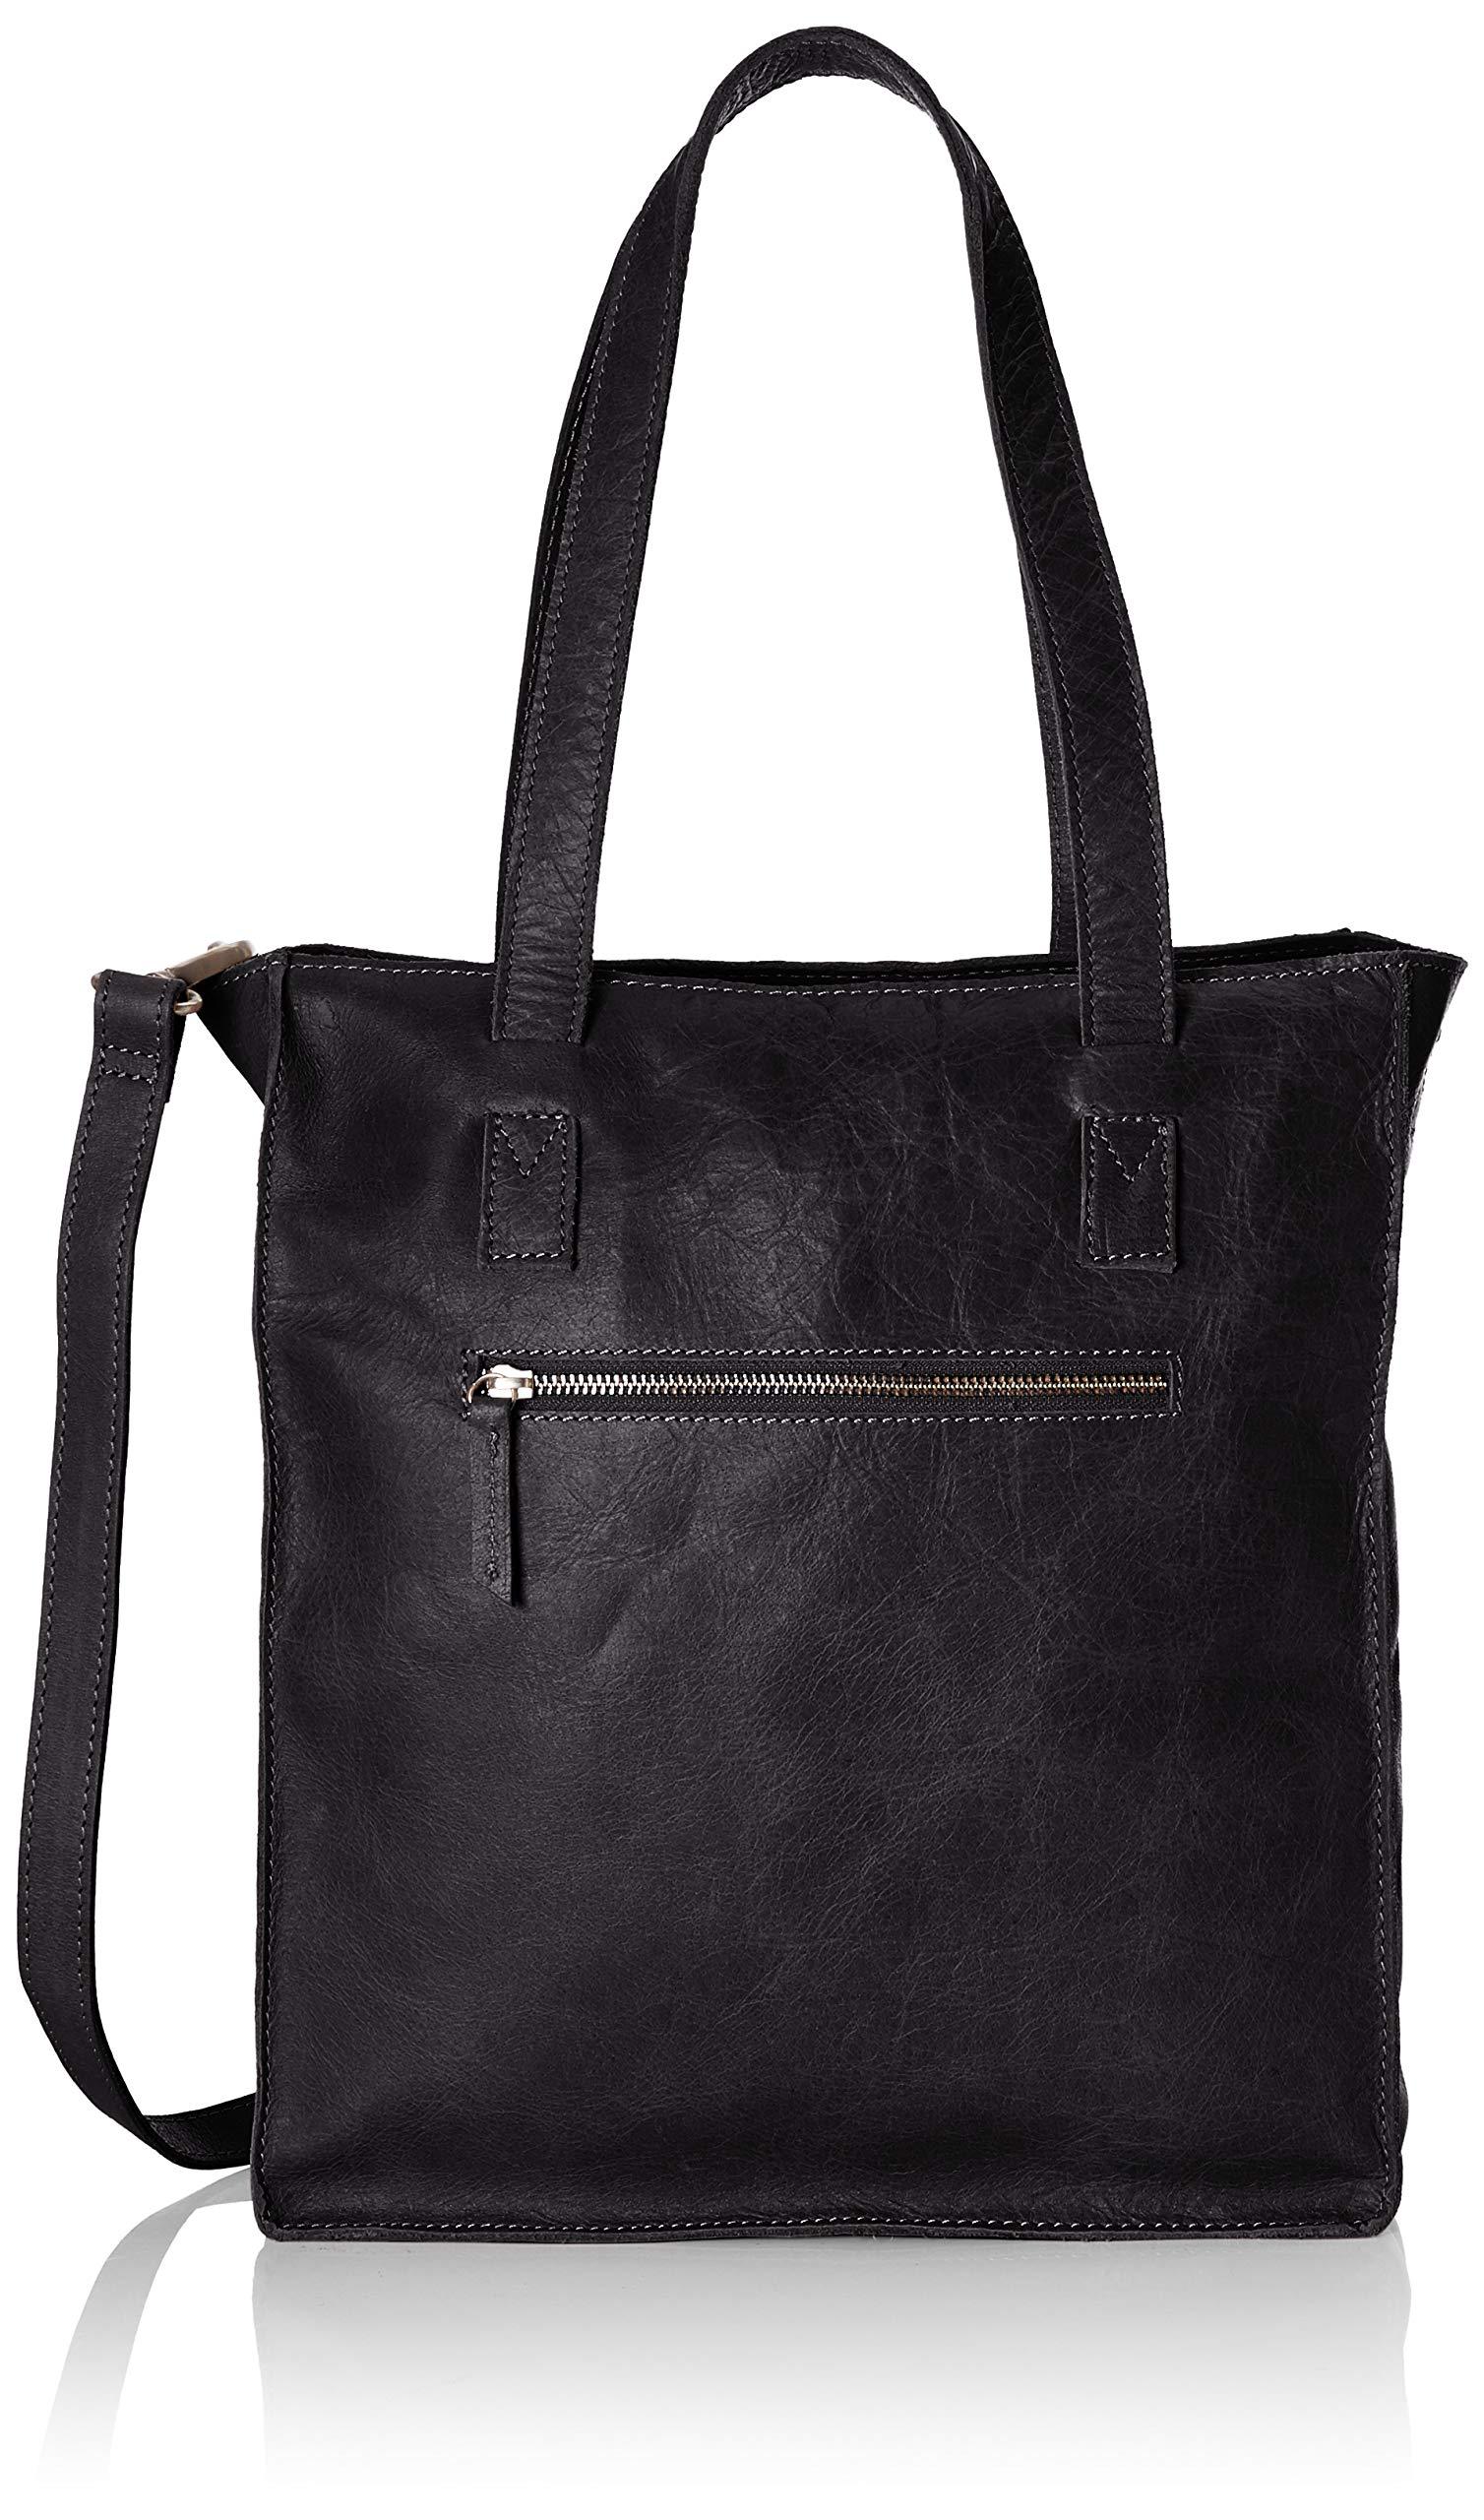 Menotte T Cowboysbag JupiterSacs FemmeNoirblack5x5x5 Bag X Cmb H thrdCBsQxo